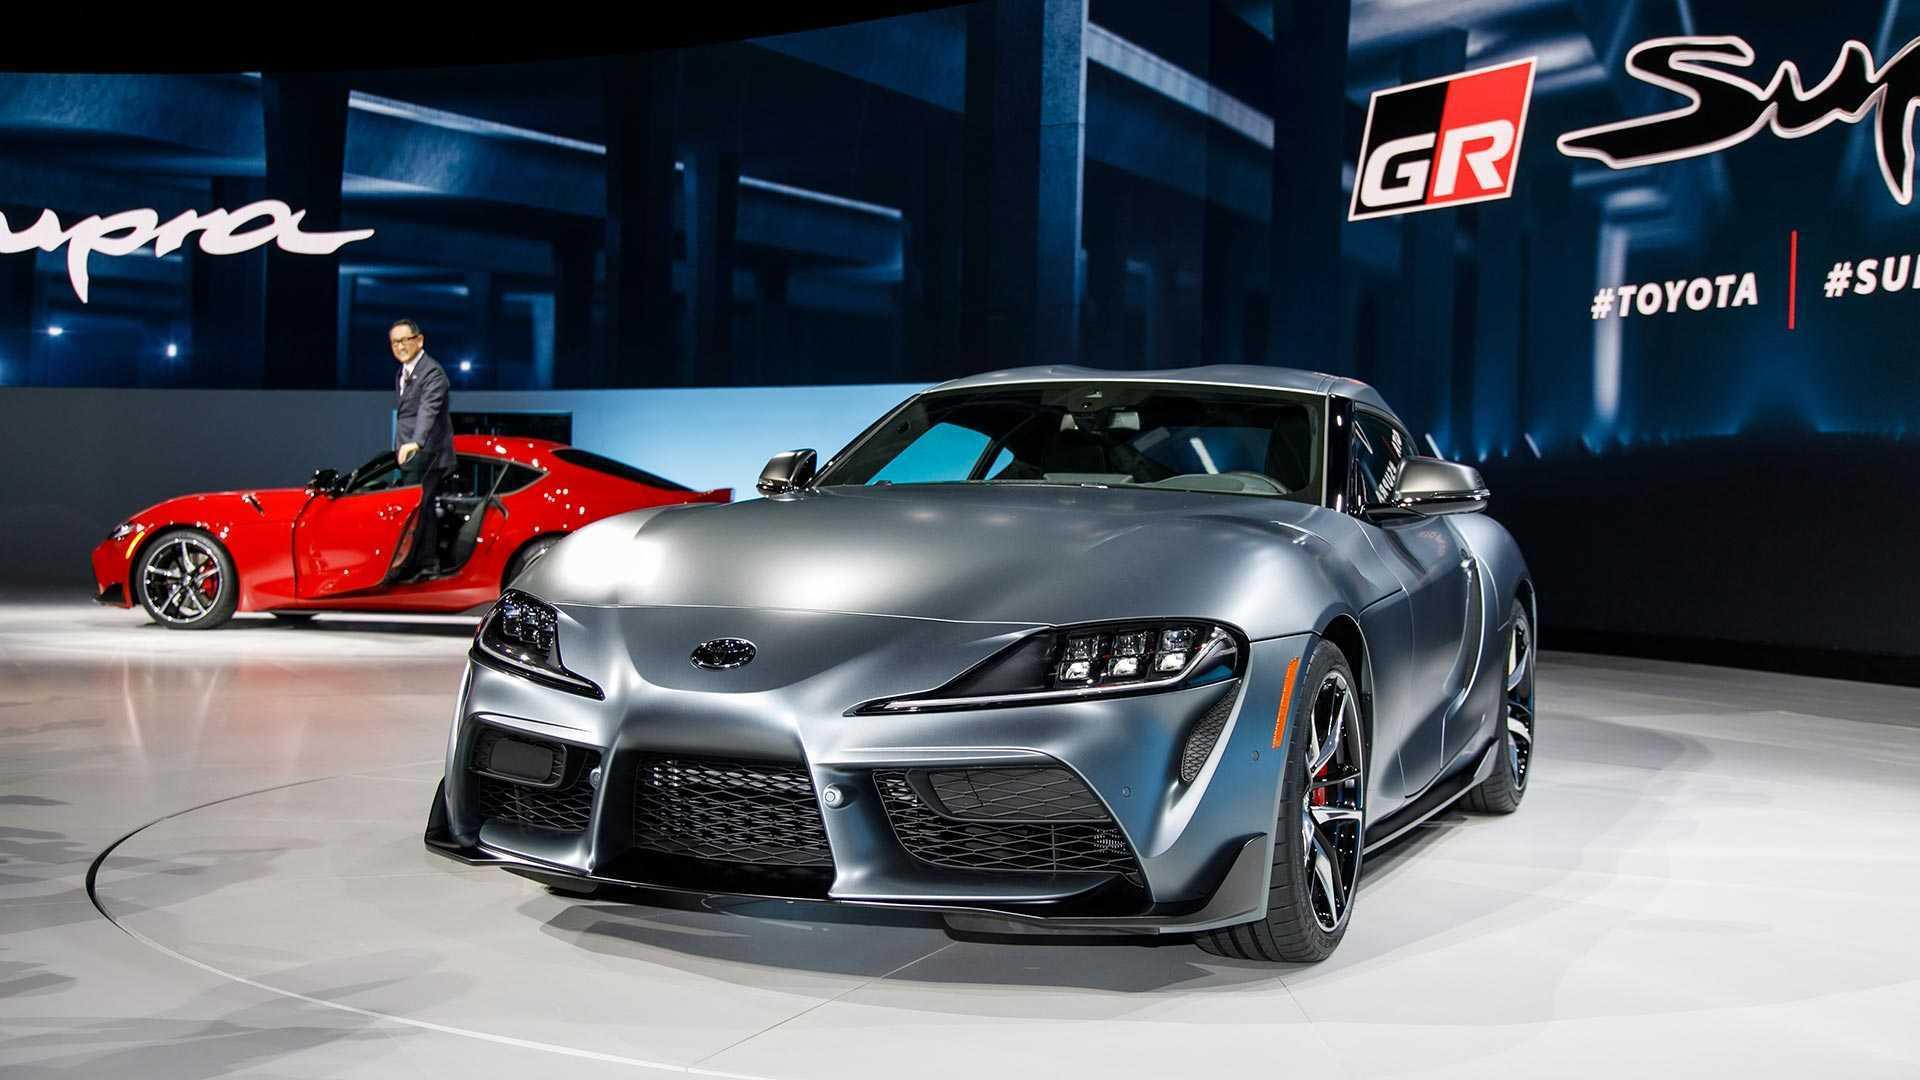 Kekurangan Toyota Su Murah Berkualitas